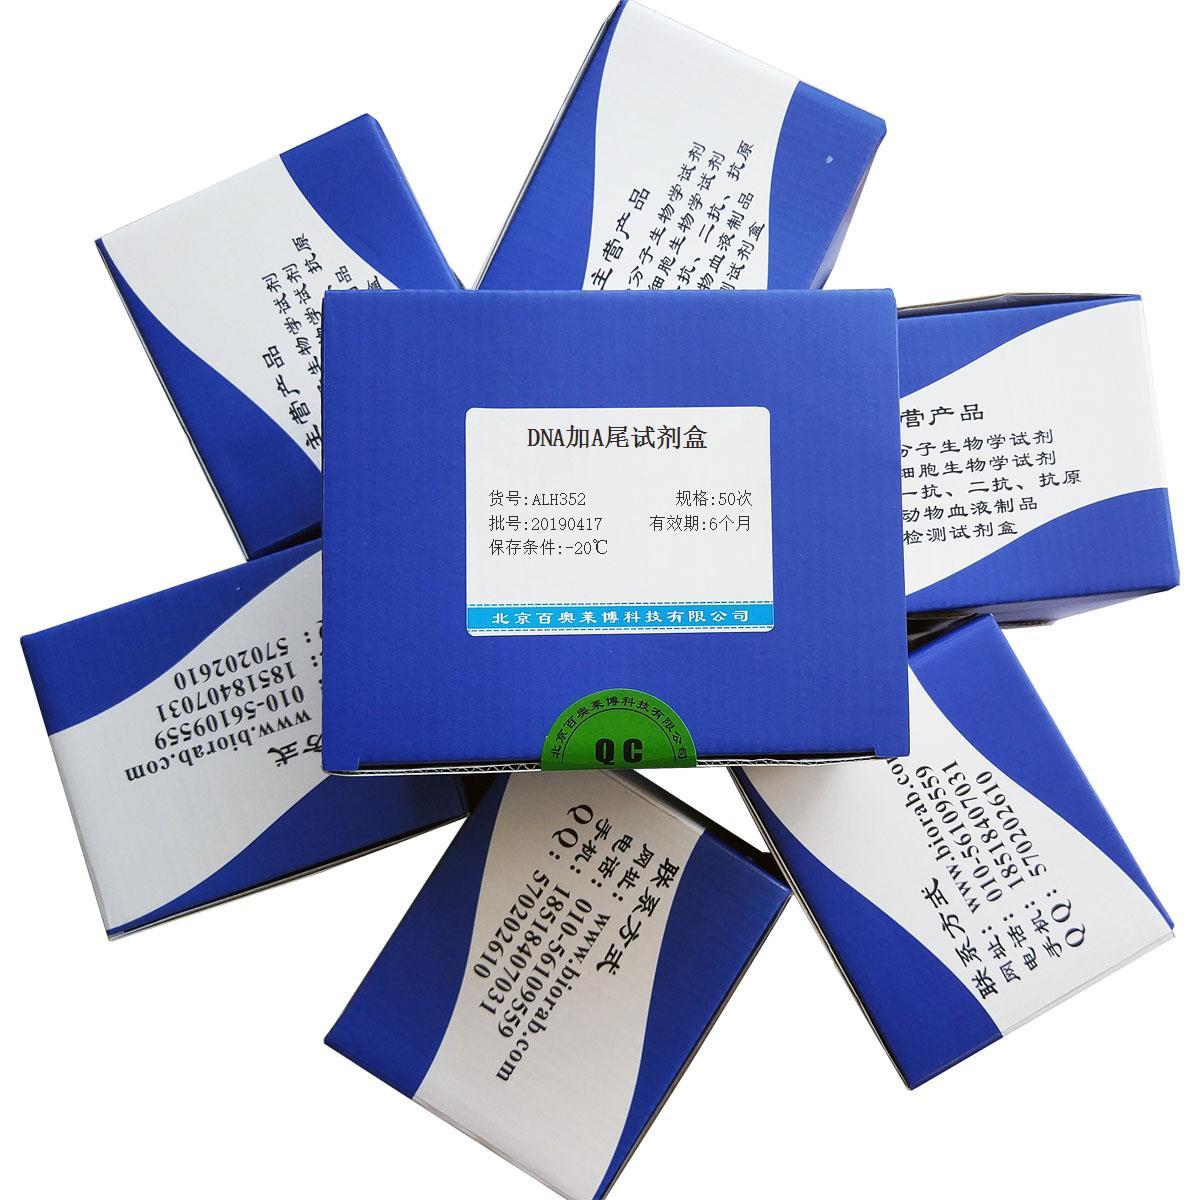 DNA加A尾试剂盒北京价格